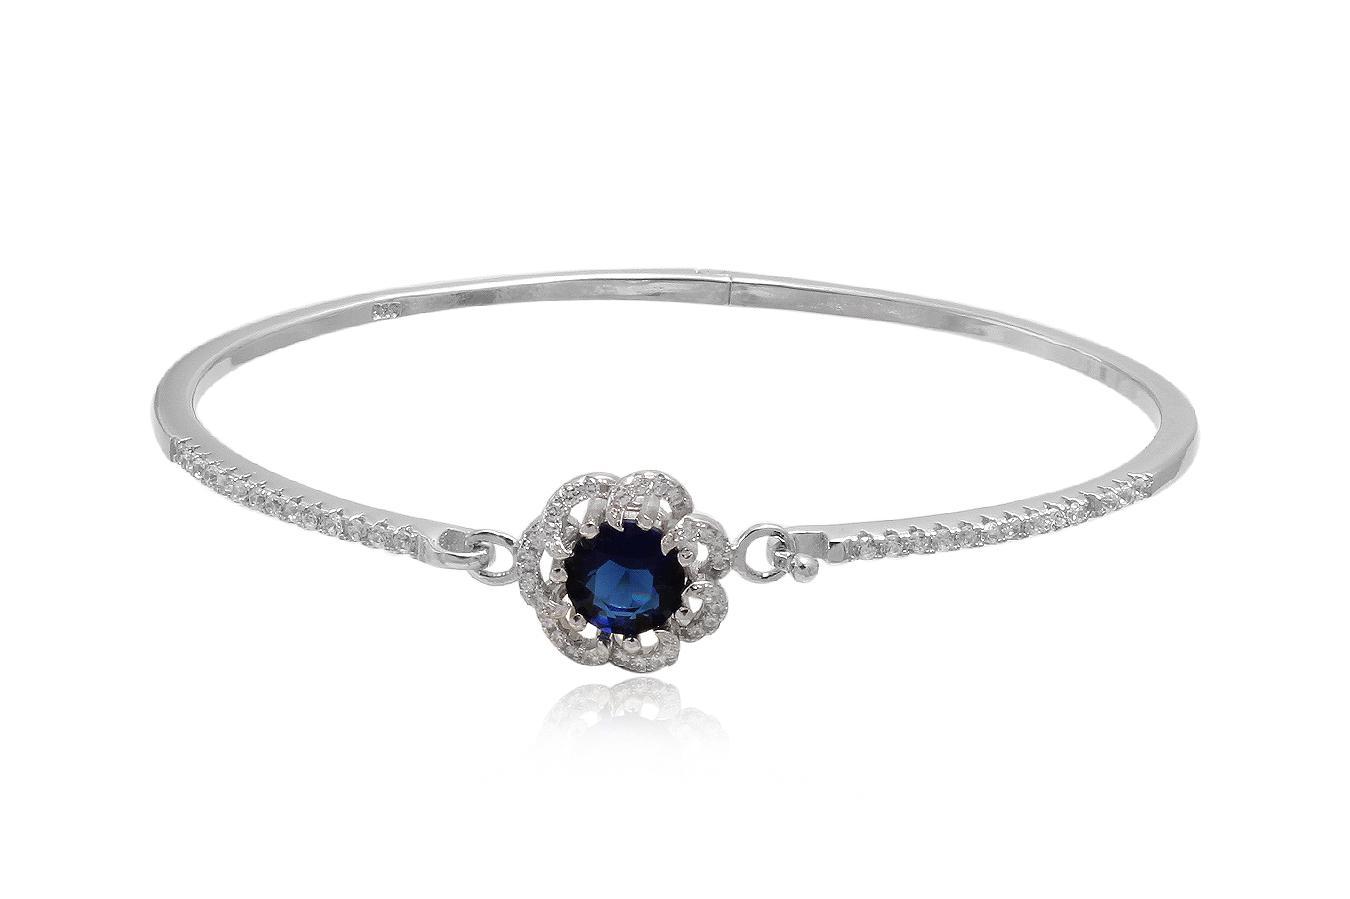 bratara argint cu floare albastra